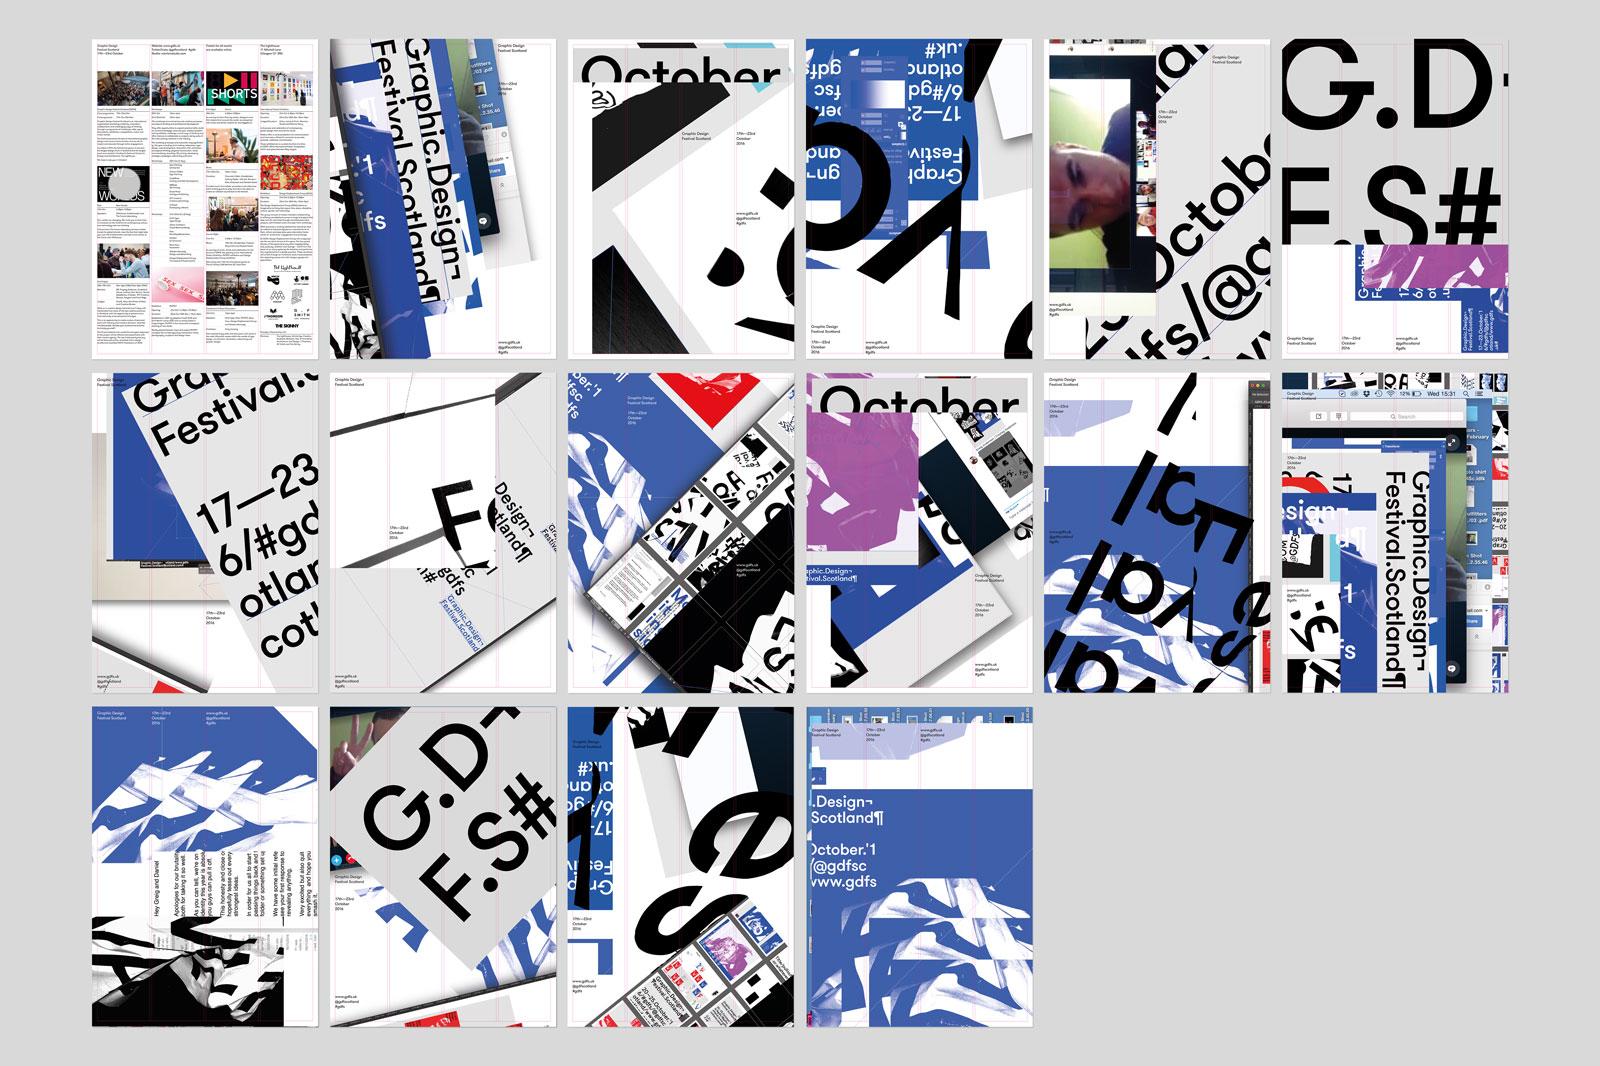 1gdfs-16-custom-identity-posters